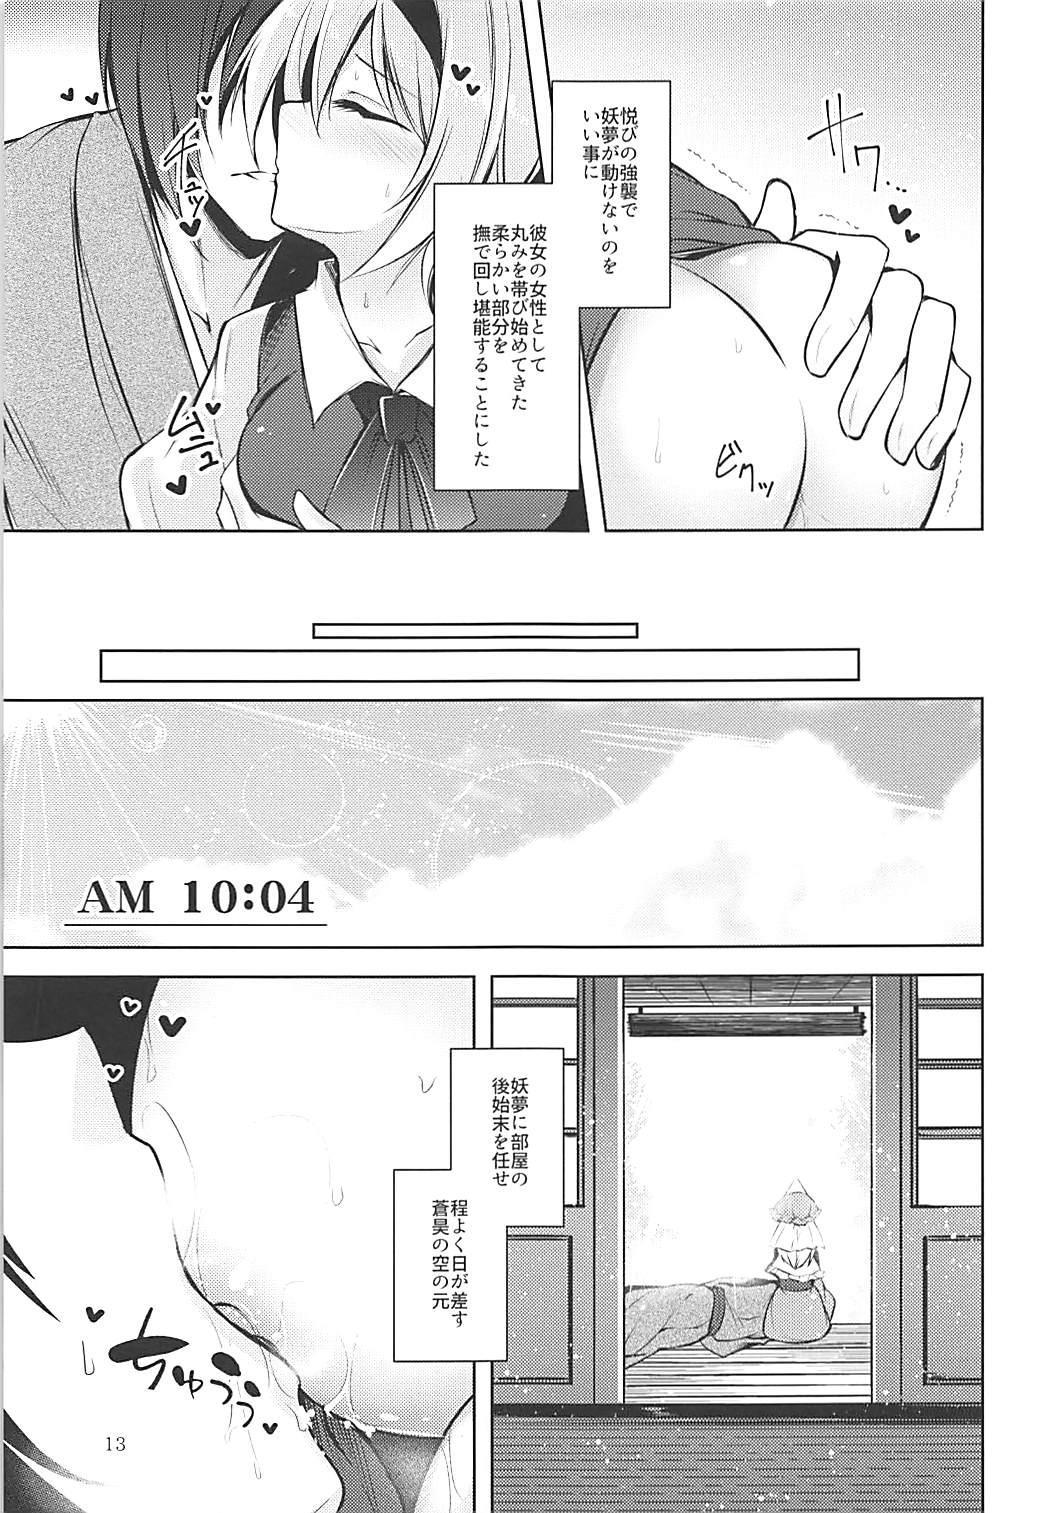 Hakumayo Schedule AM 13